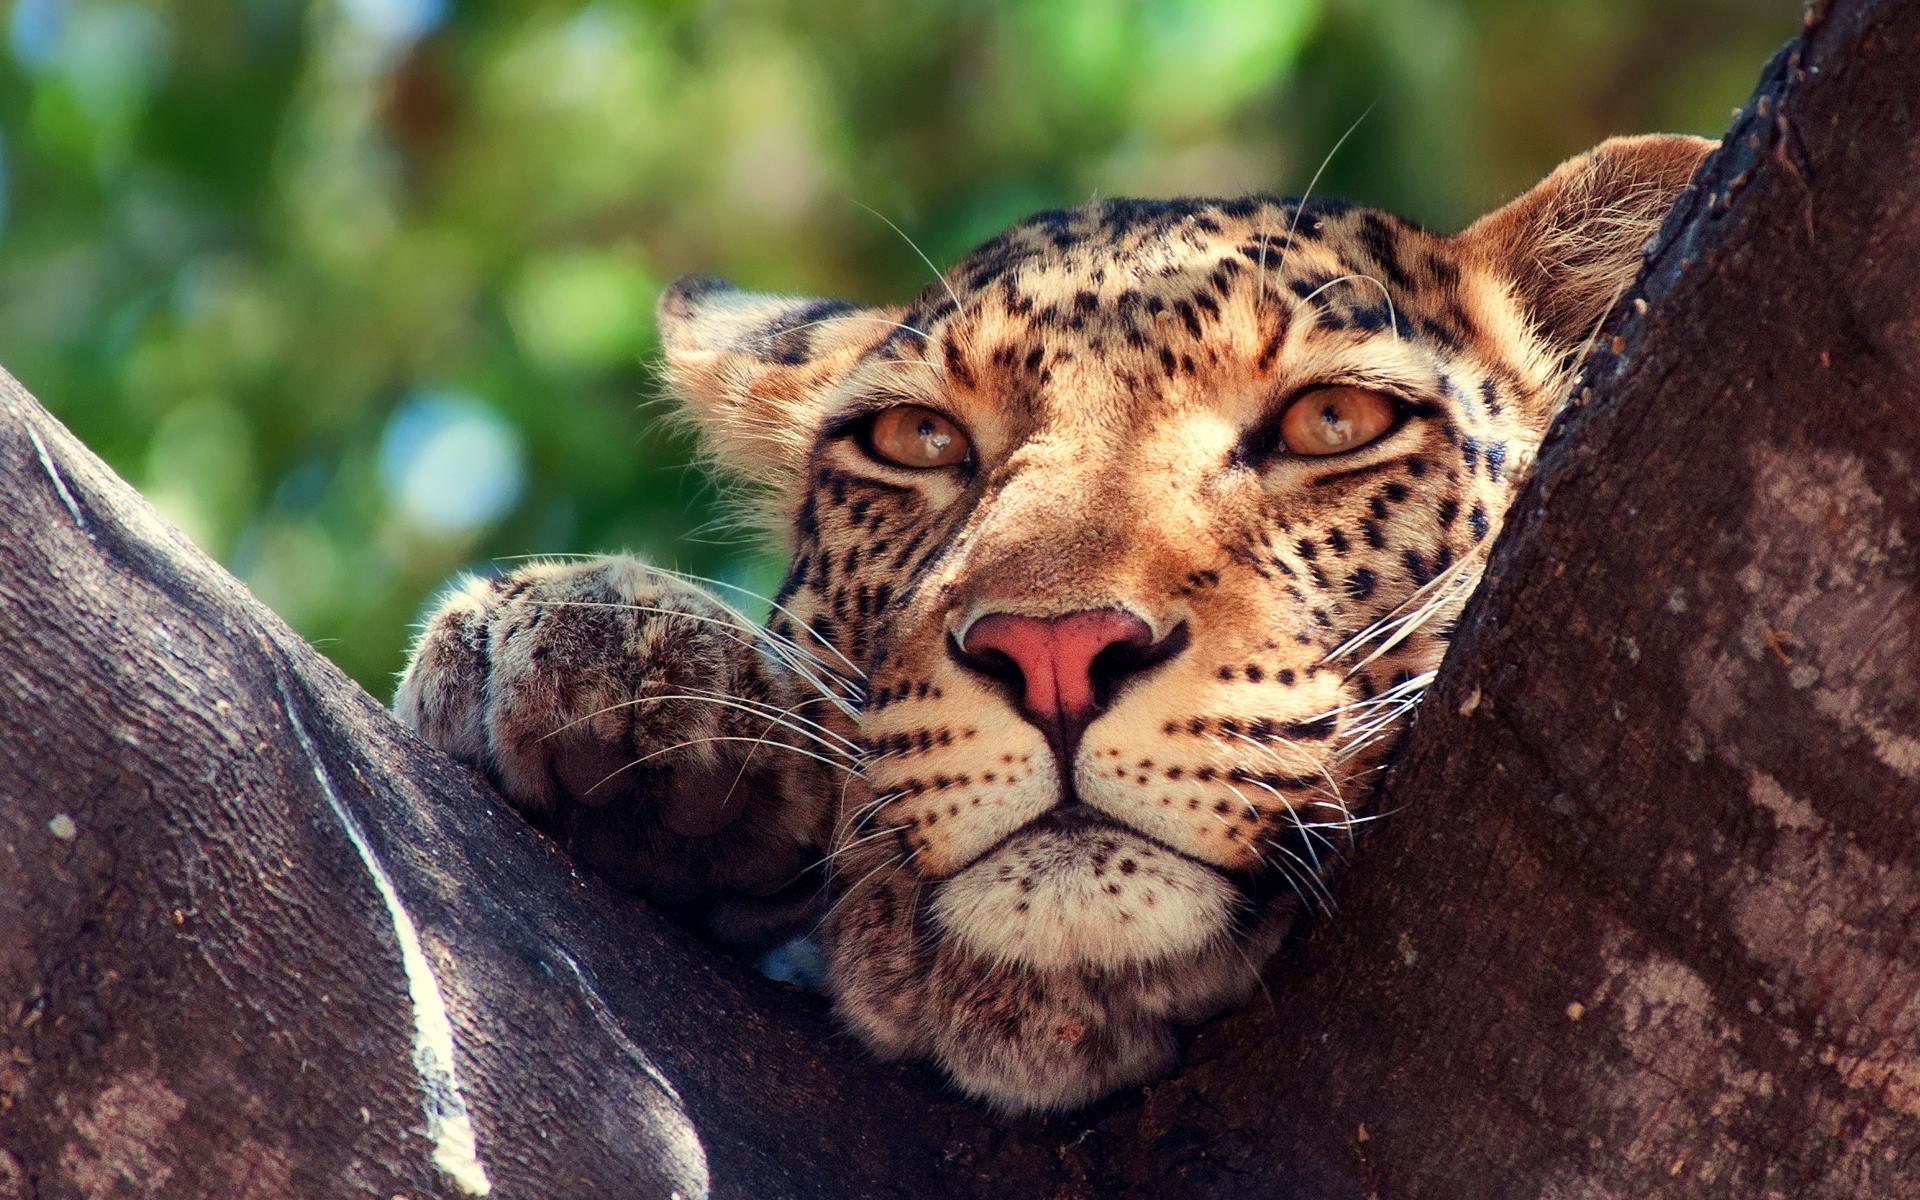 leopard wallpaper nature